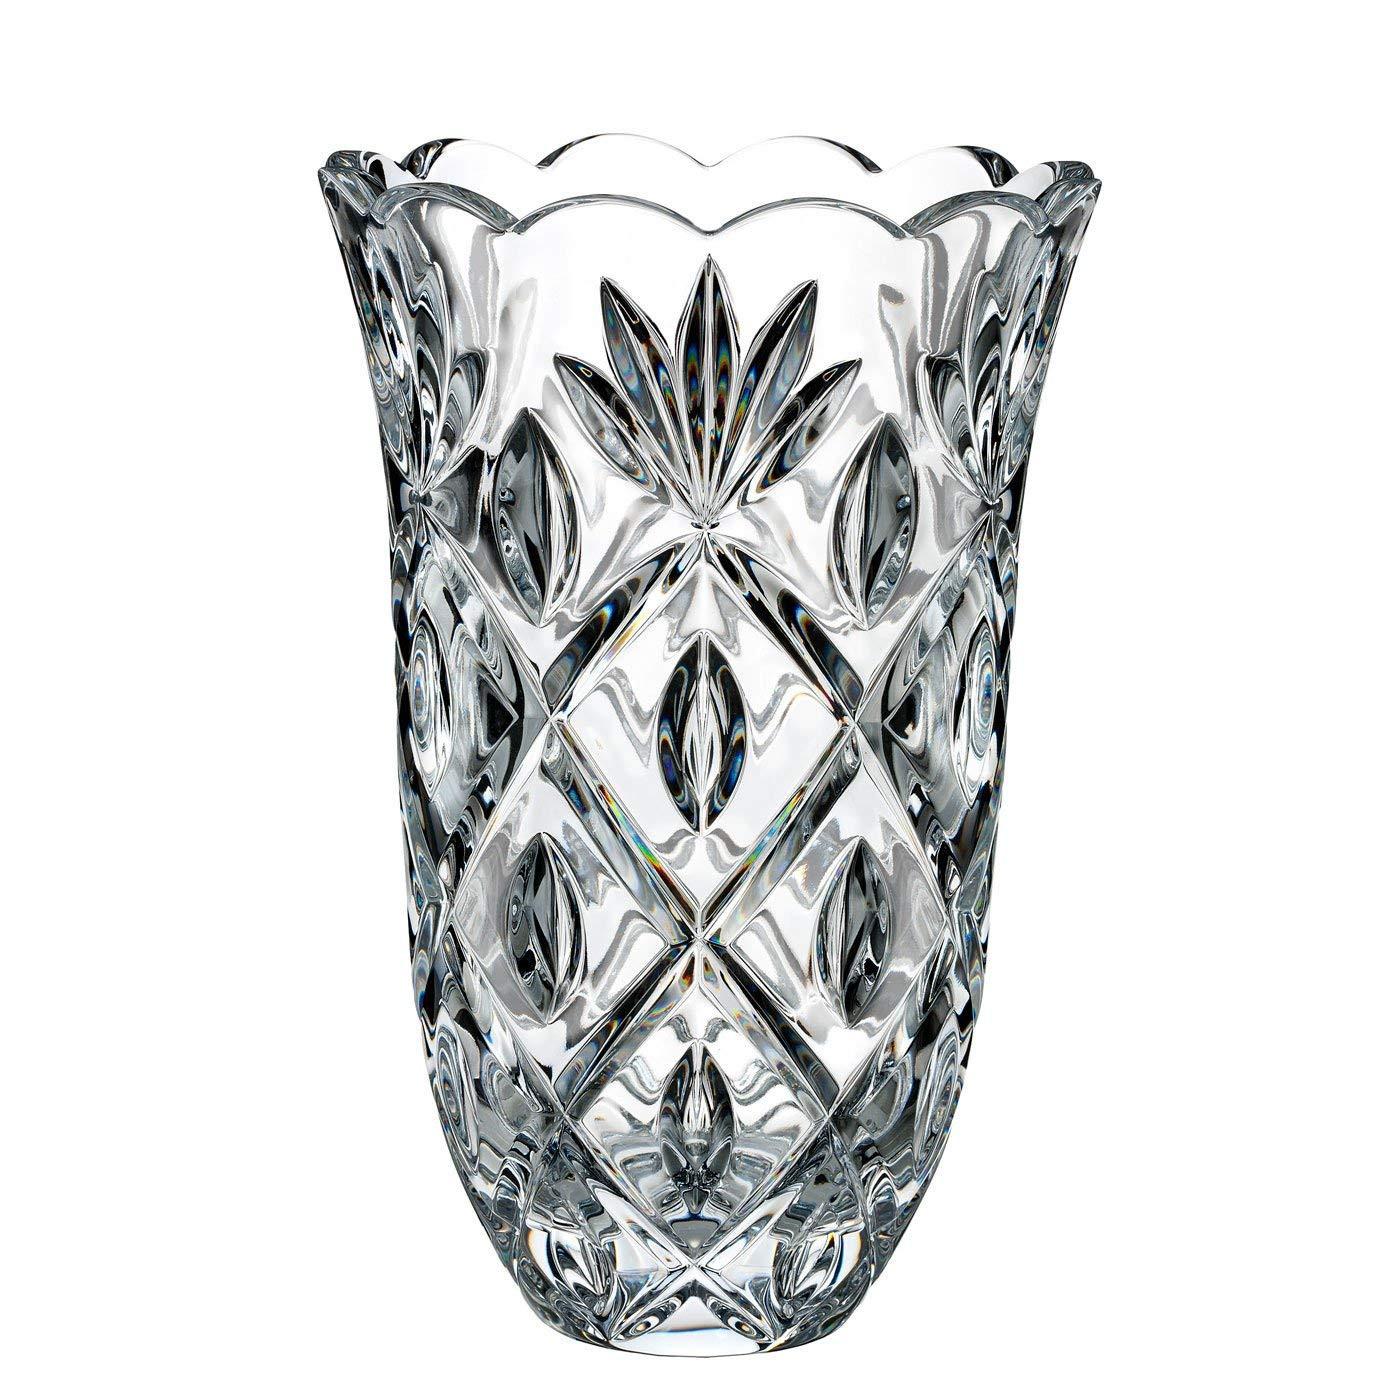 waterford lismore vase 10 inch of amazon com waterford crystal sara 10 vase serving bowls in 81mvztx4ctl sl1400